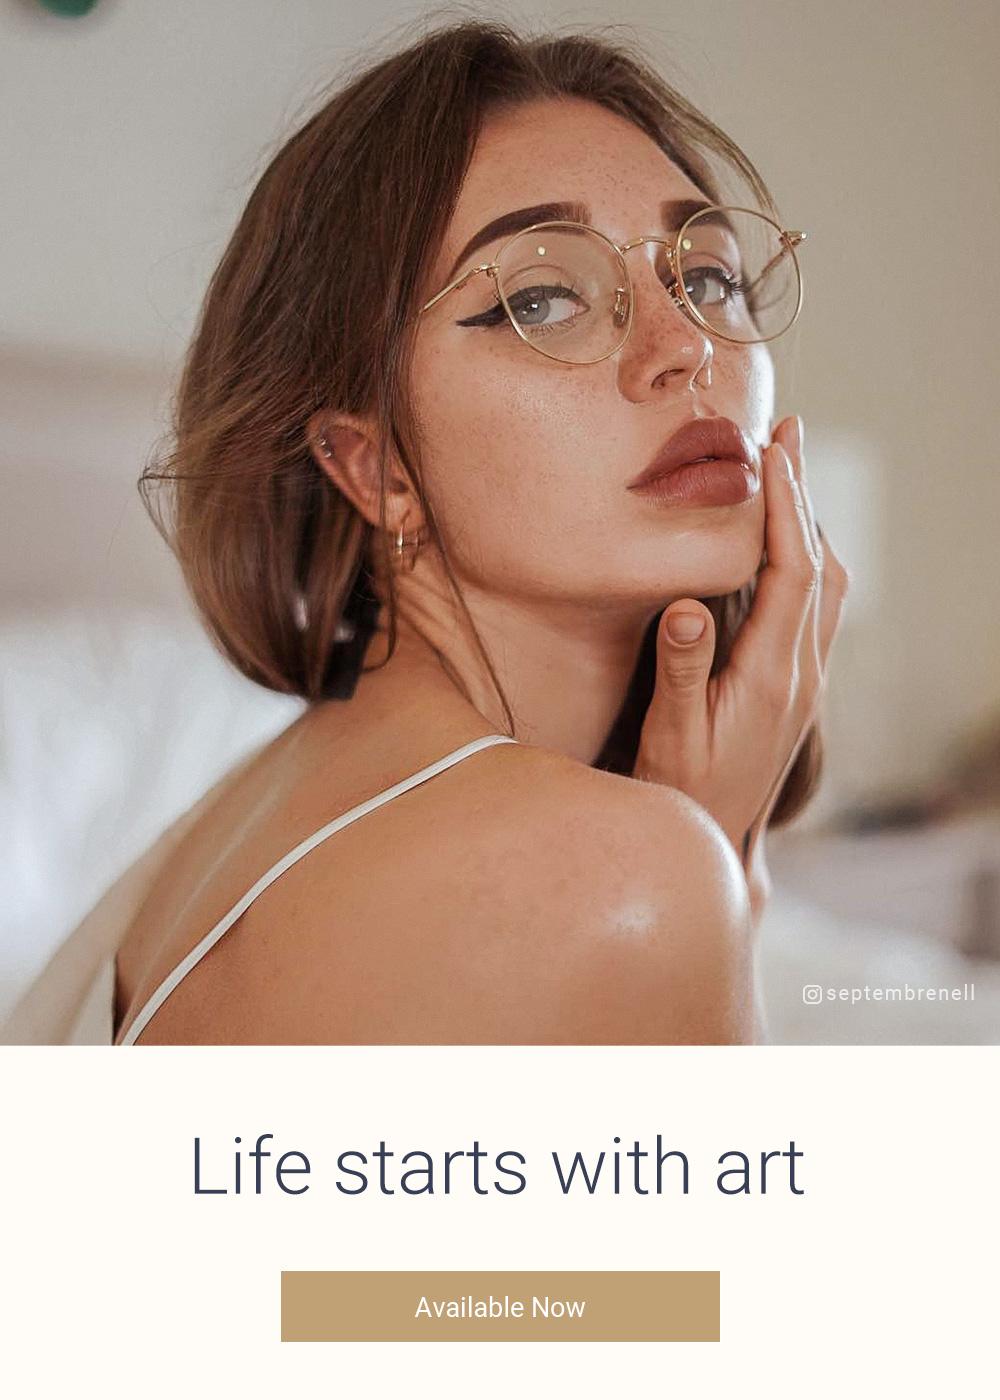 721eeeadb282 Shop Eyeglasses & Sunglasses Online - Rx Glasses | TIJN® Eyewear